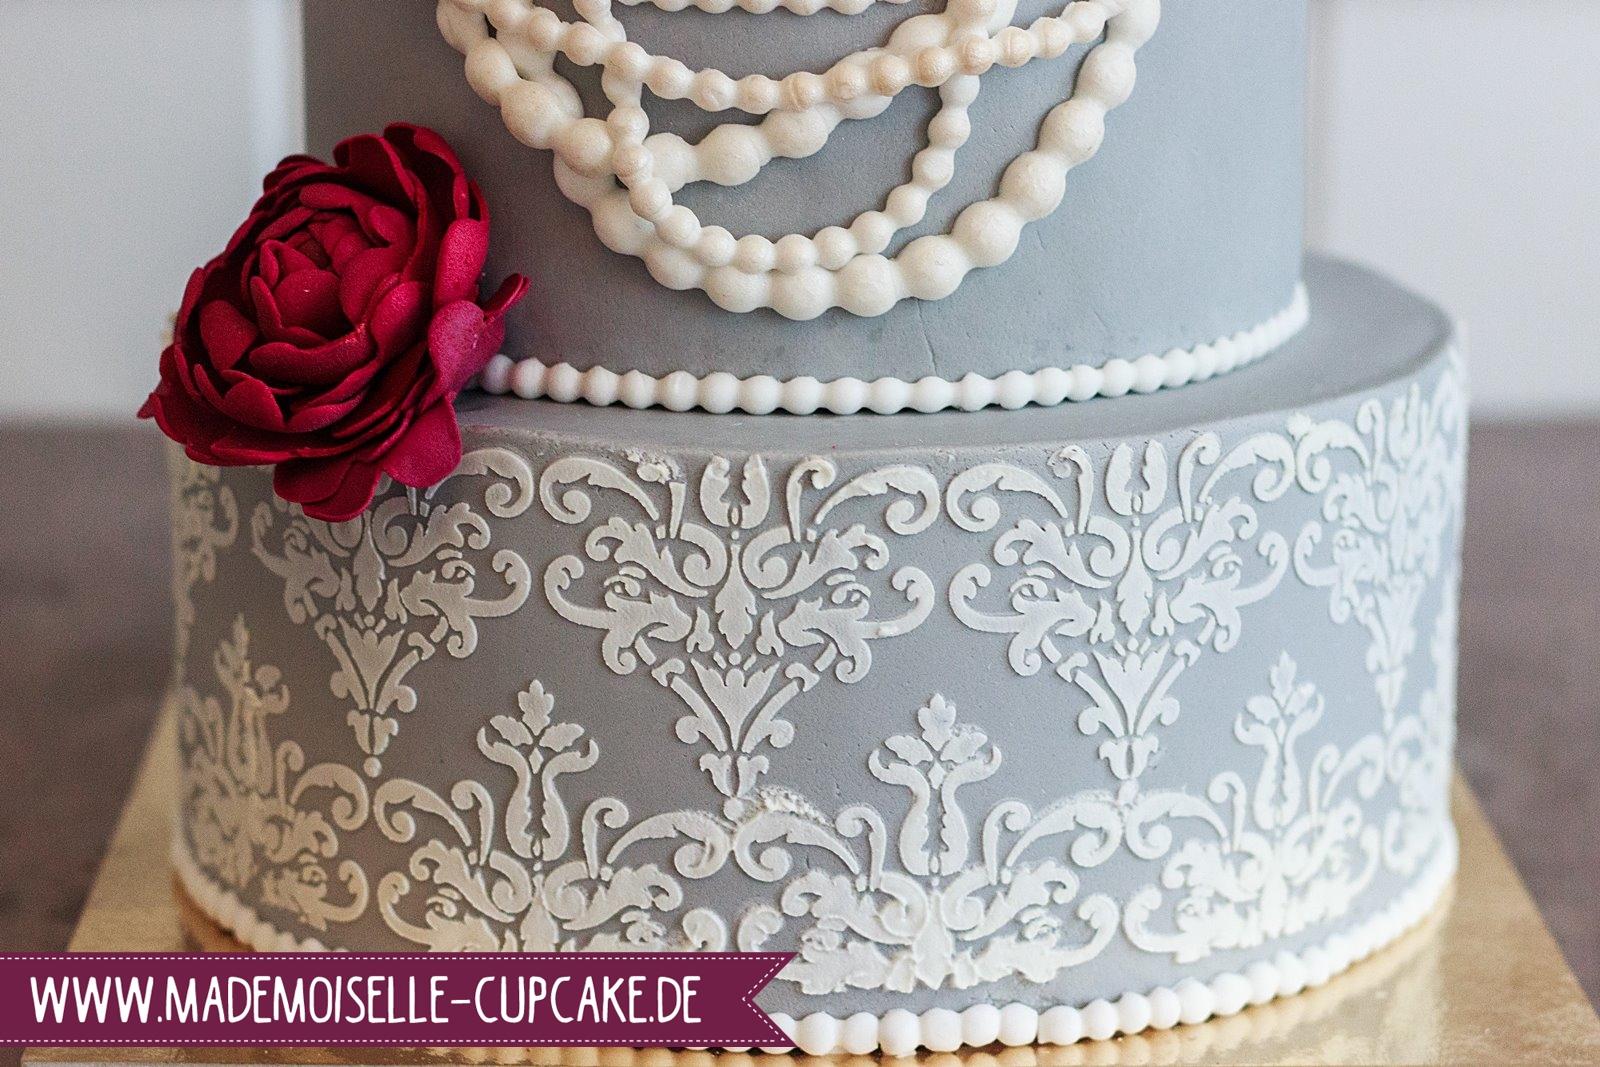 Img 9953 2 Mademoiselle Cupcake